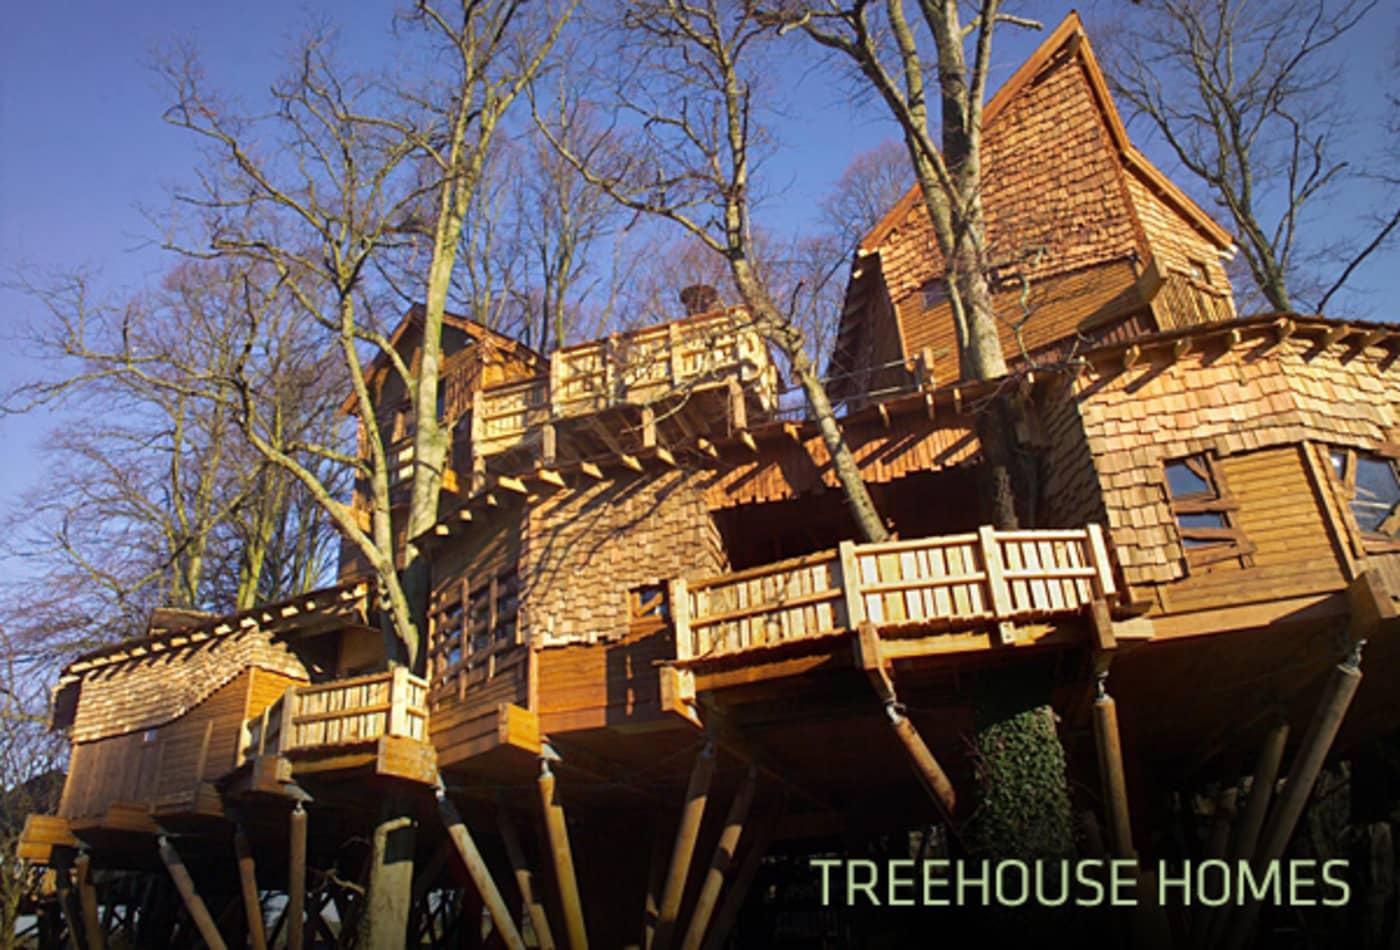 Treehouse_Homes_Cover.jpg